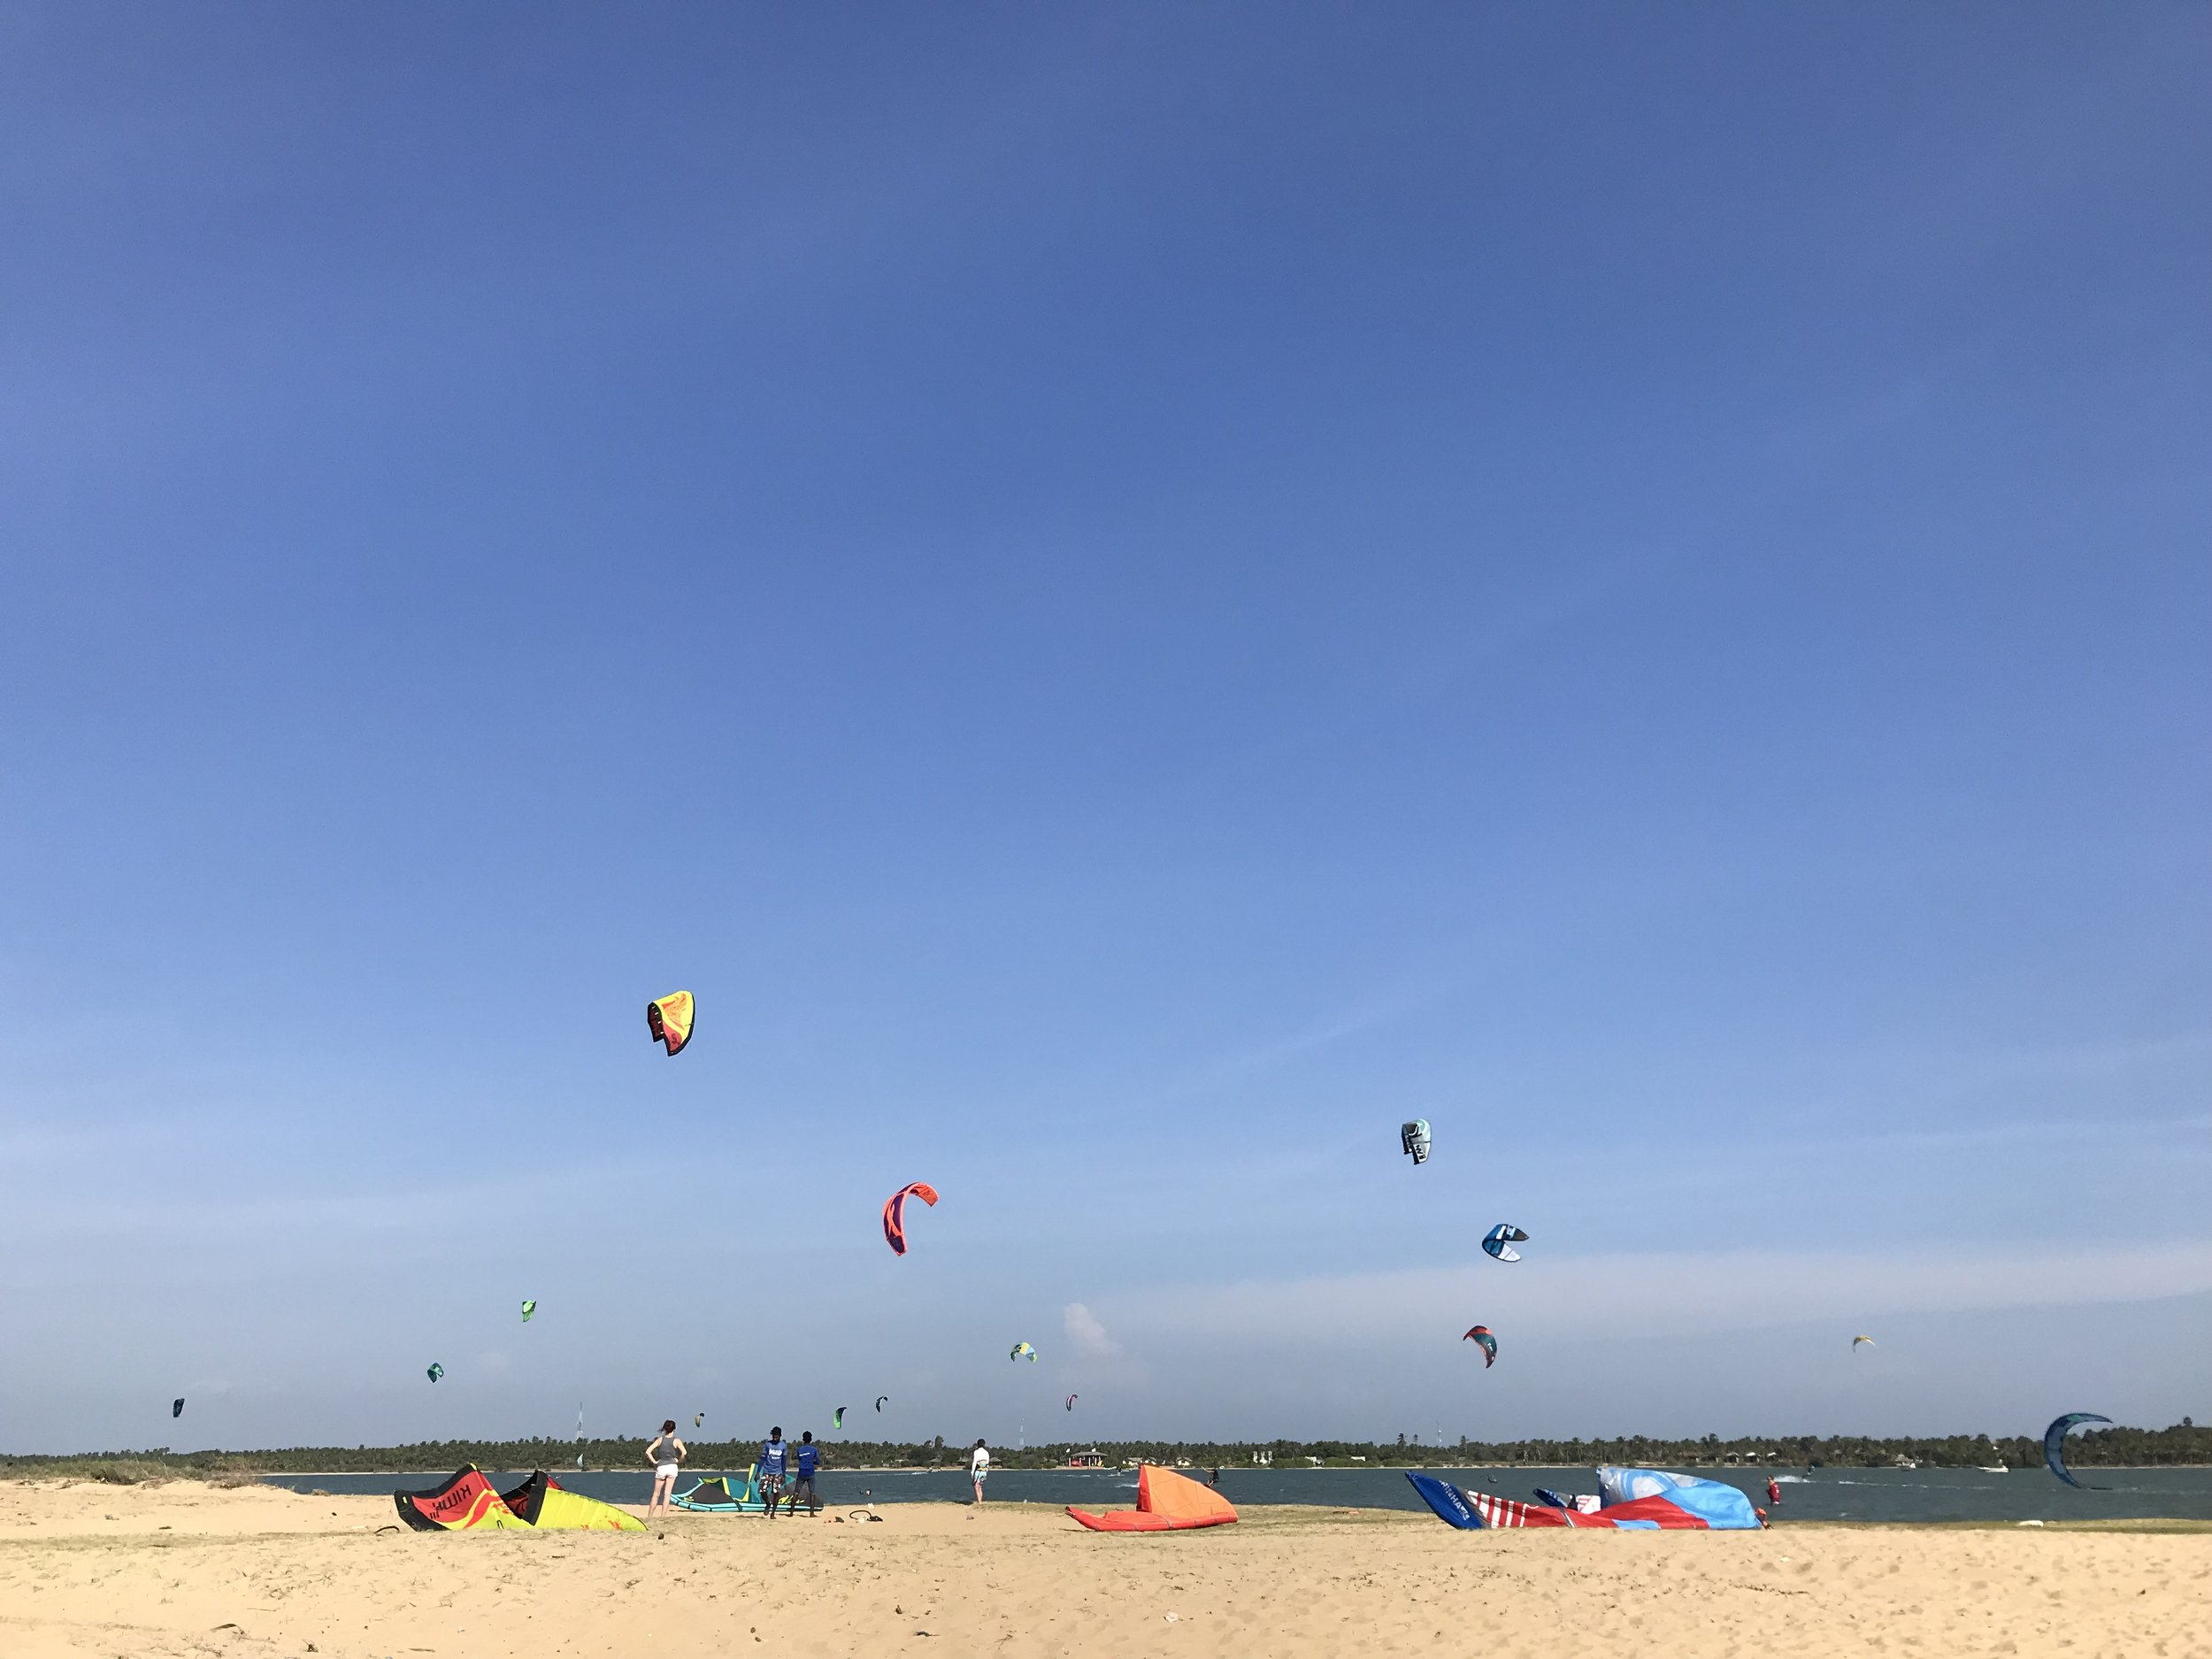 Kite Surfing Sri Lanka.JPG